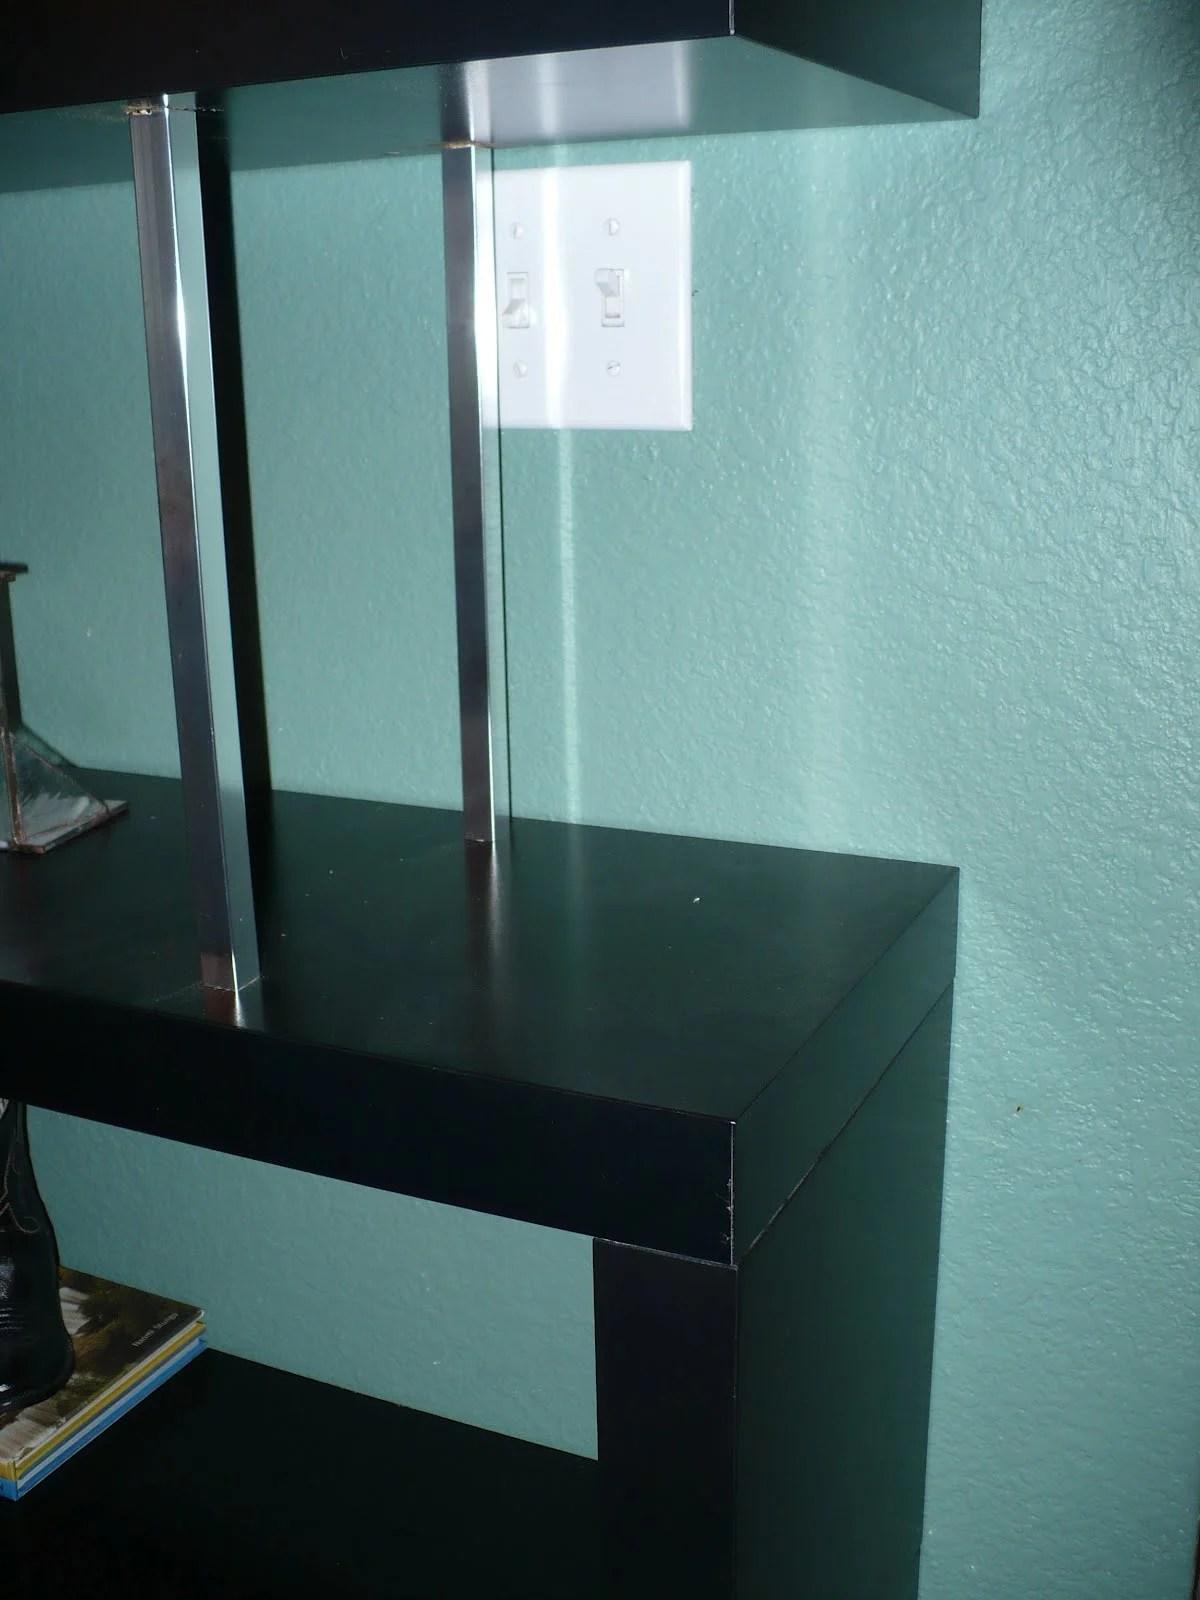 Zig zag lack shelf bookcase ikea hackers for Ikea lack mensola